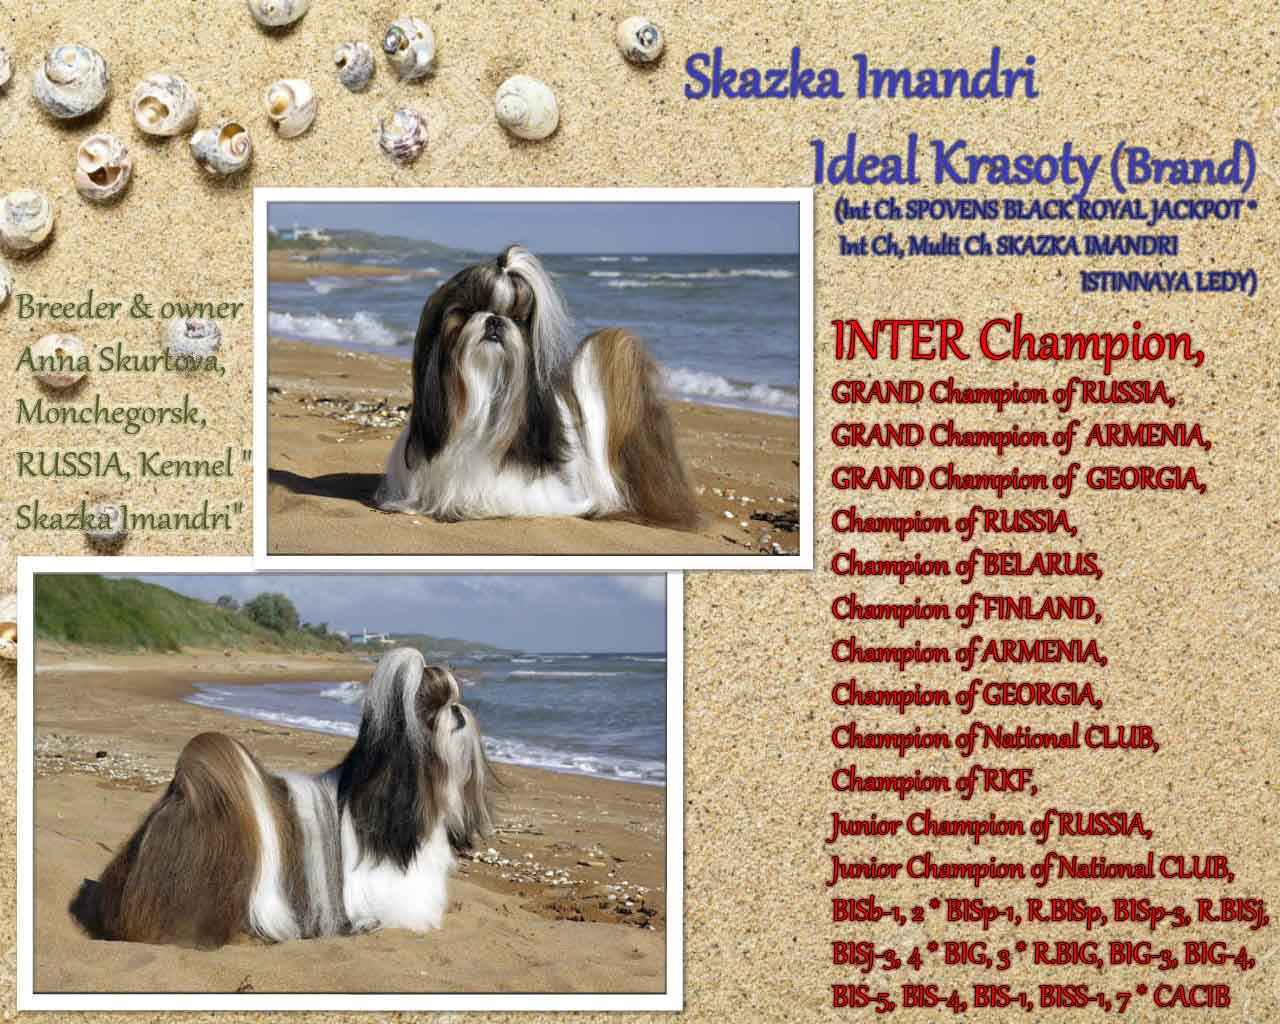 INTER CH, MULTI CH, GRAND CH Skazka Imandri IDEAL KRASOTY (Brand)